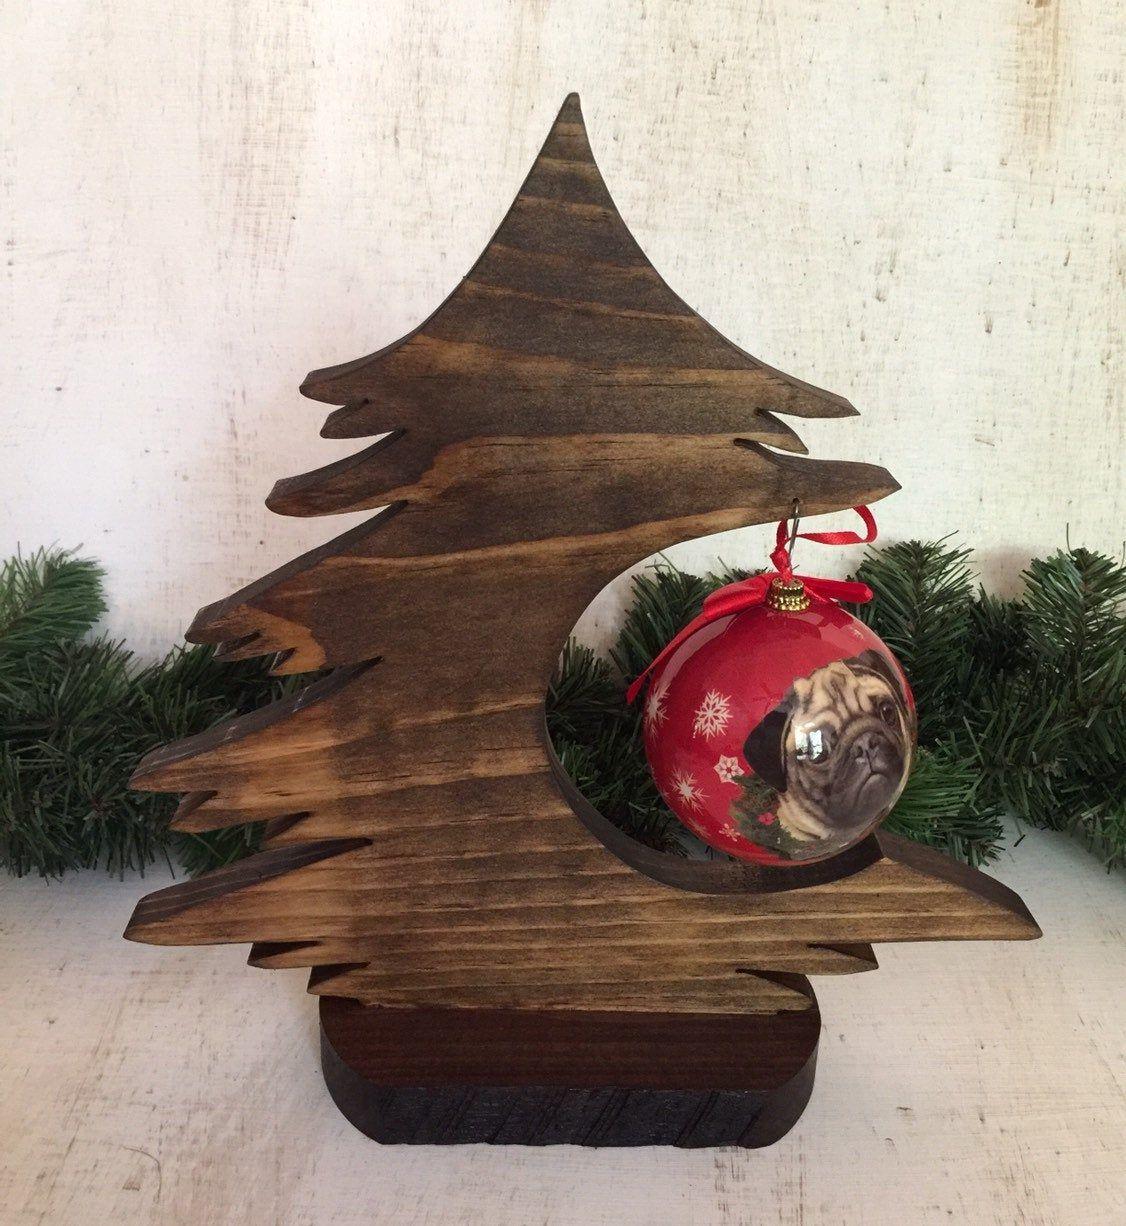 Wood Christmas Tree Ornament Hangerrustic Christmas Tree Etsy Christmas Tree Holder Christmas Tree Ornaments Rustic Christmas Tree